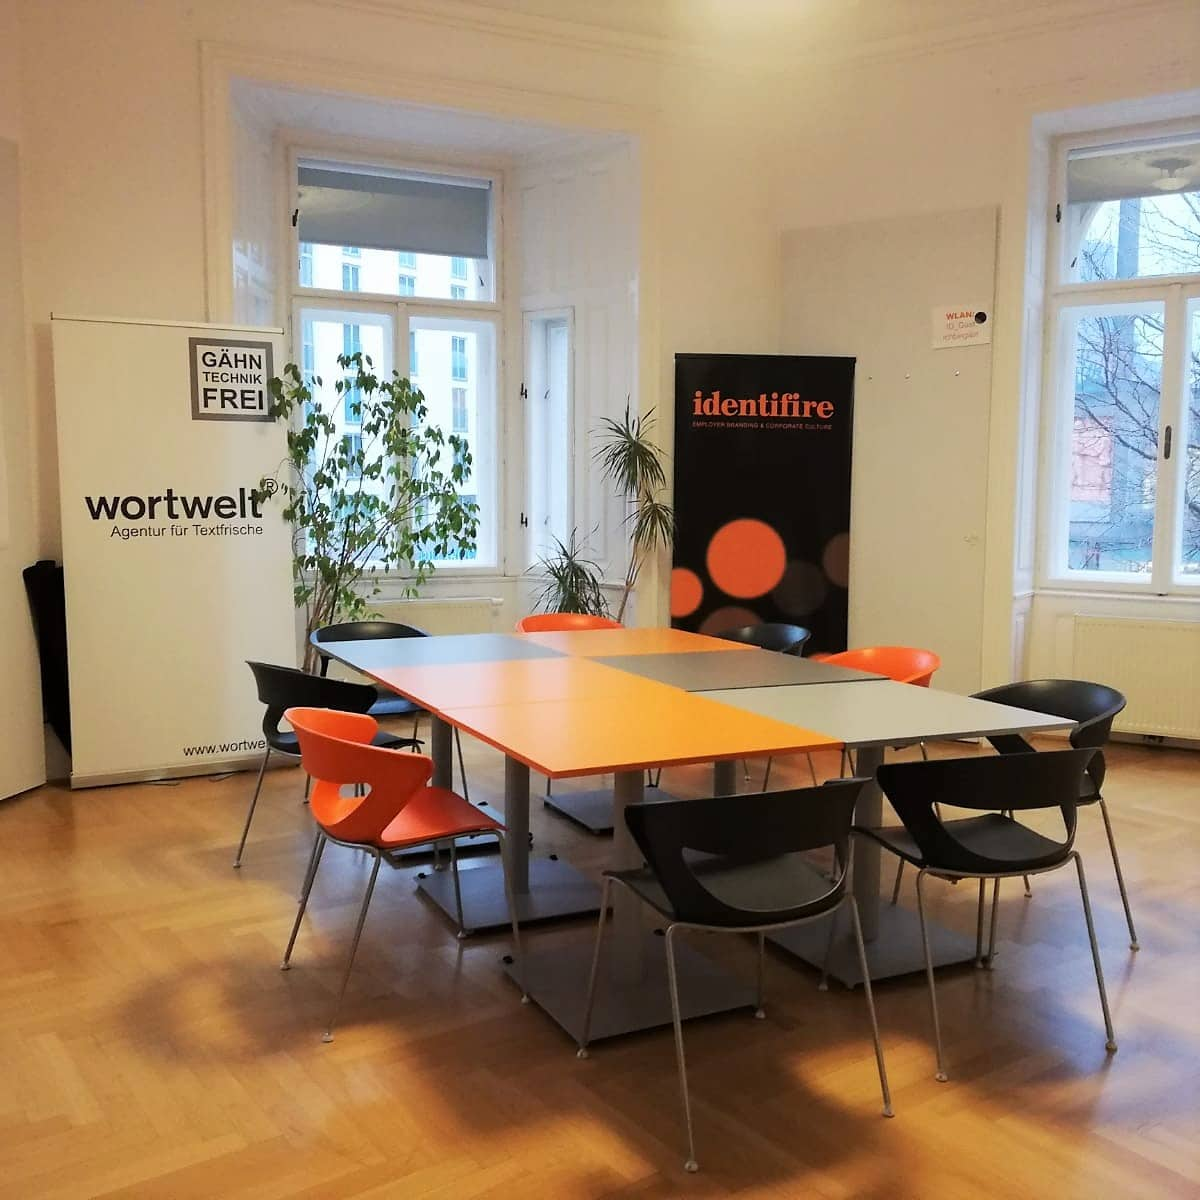 Identifire Büro Wien Mariahilferstraße Meetingraum Seminarraum